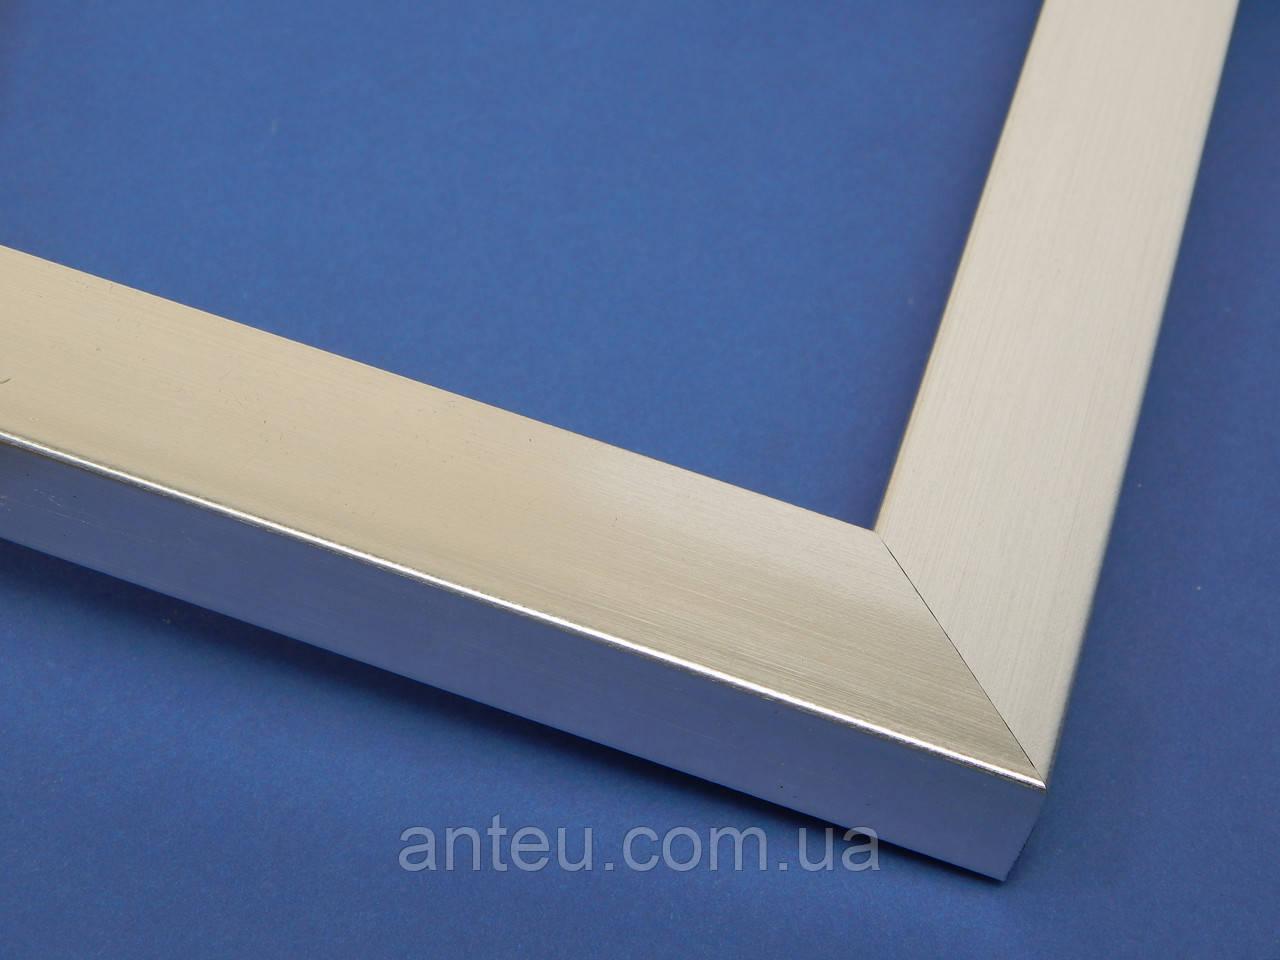 Рамка без стекла А2(420х594).Для картин,плакатов,фото...22 мм.Серебро металик